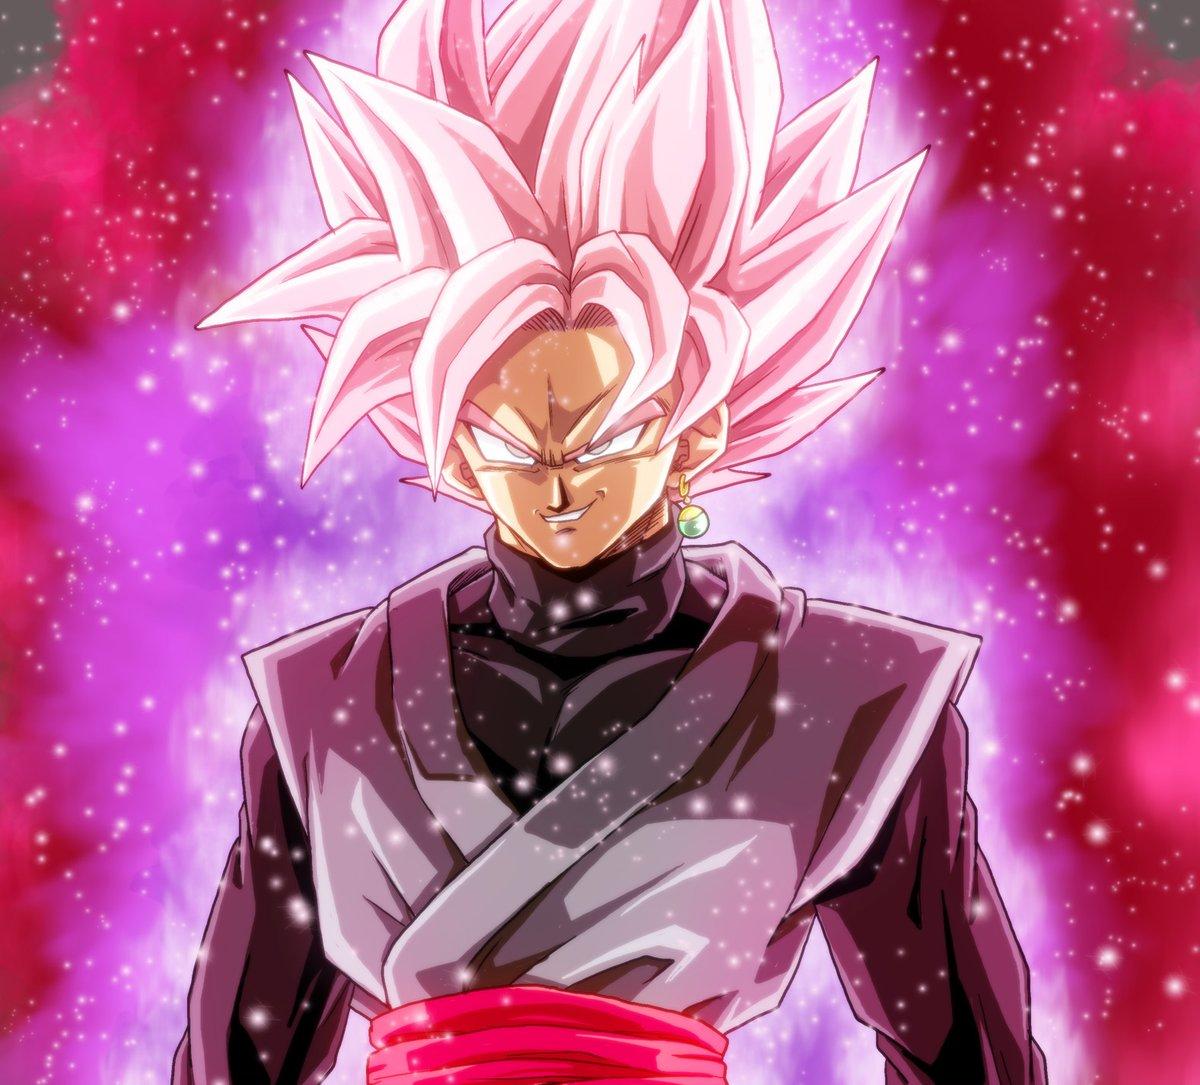 Goku Black Rose Wallpaper Posted By Zoey Mercado